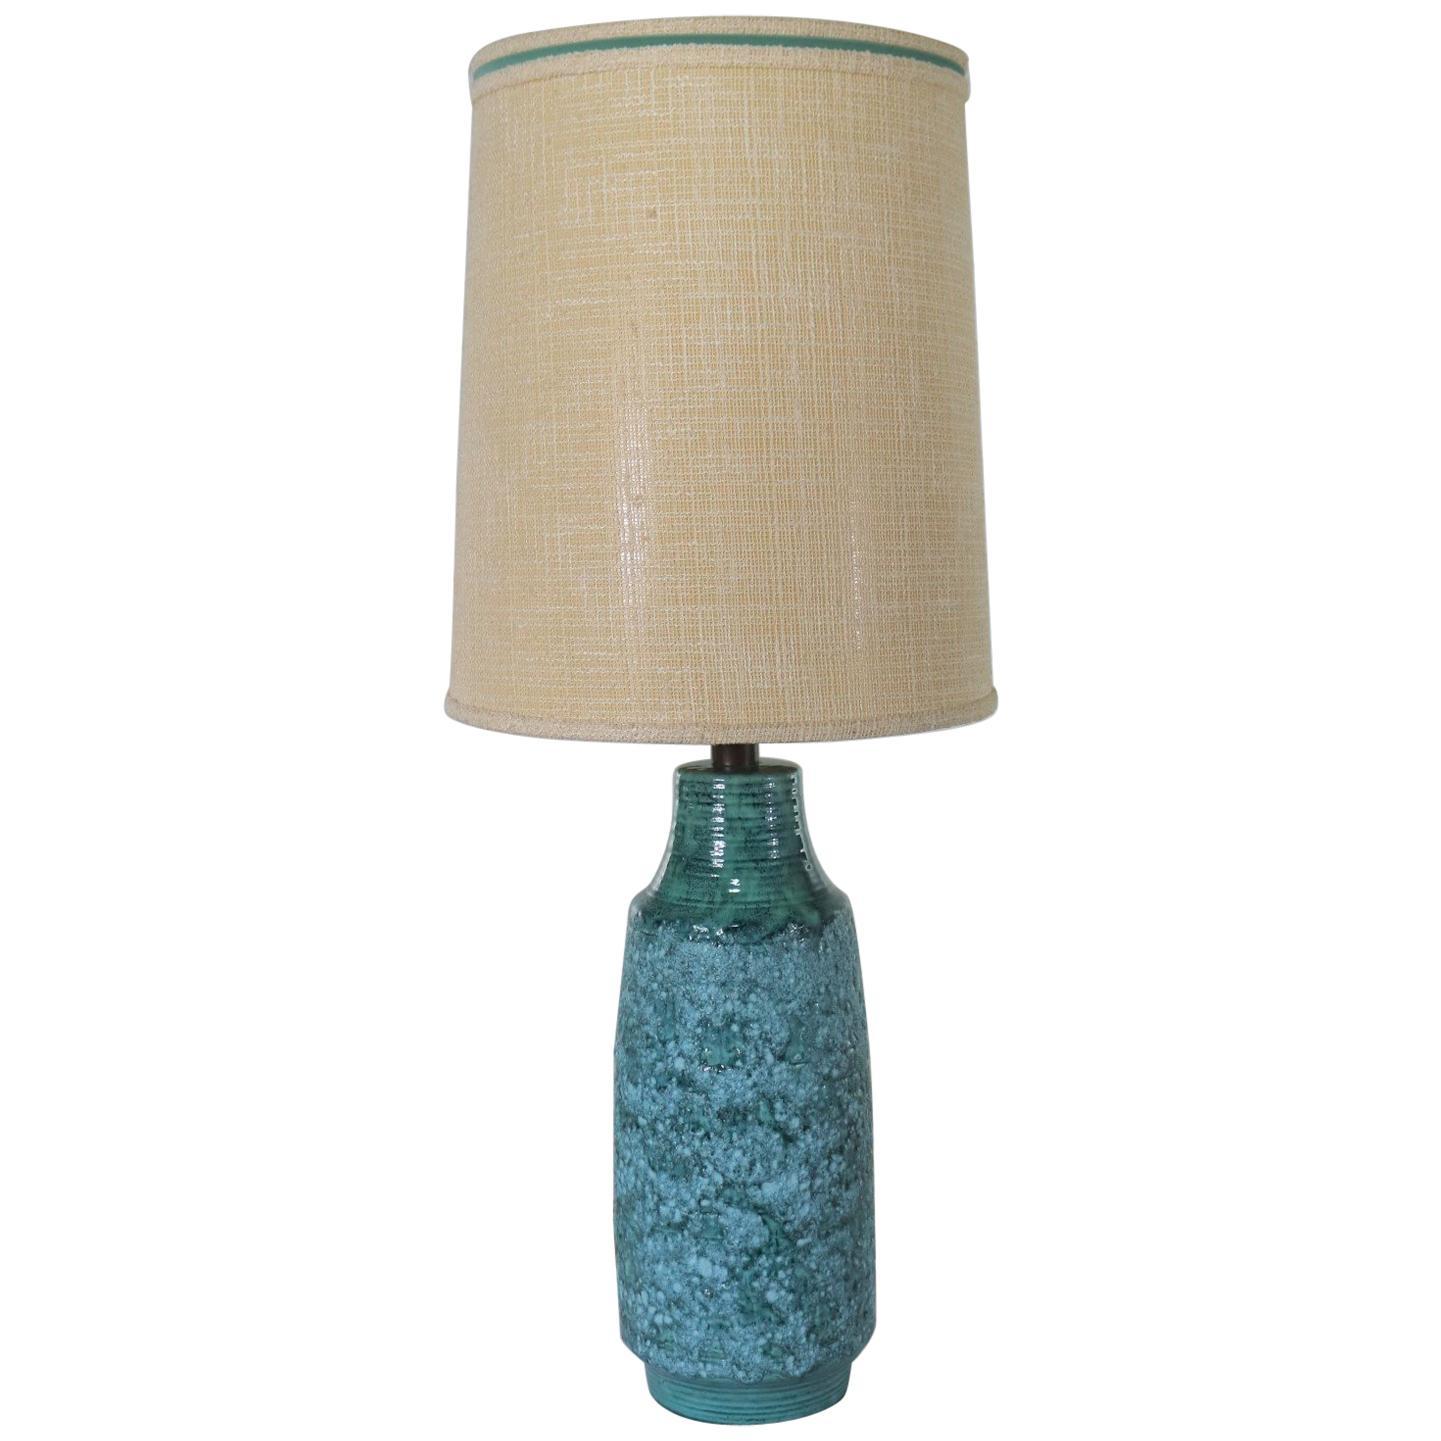 Large Mid-Century Modern Turquoise Lava Glaze Ceramic Table Lamp after Fantoni